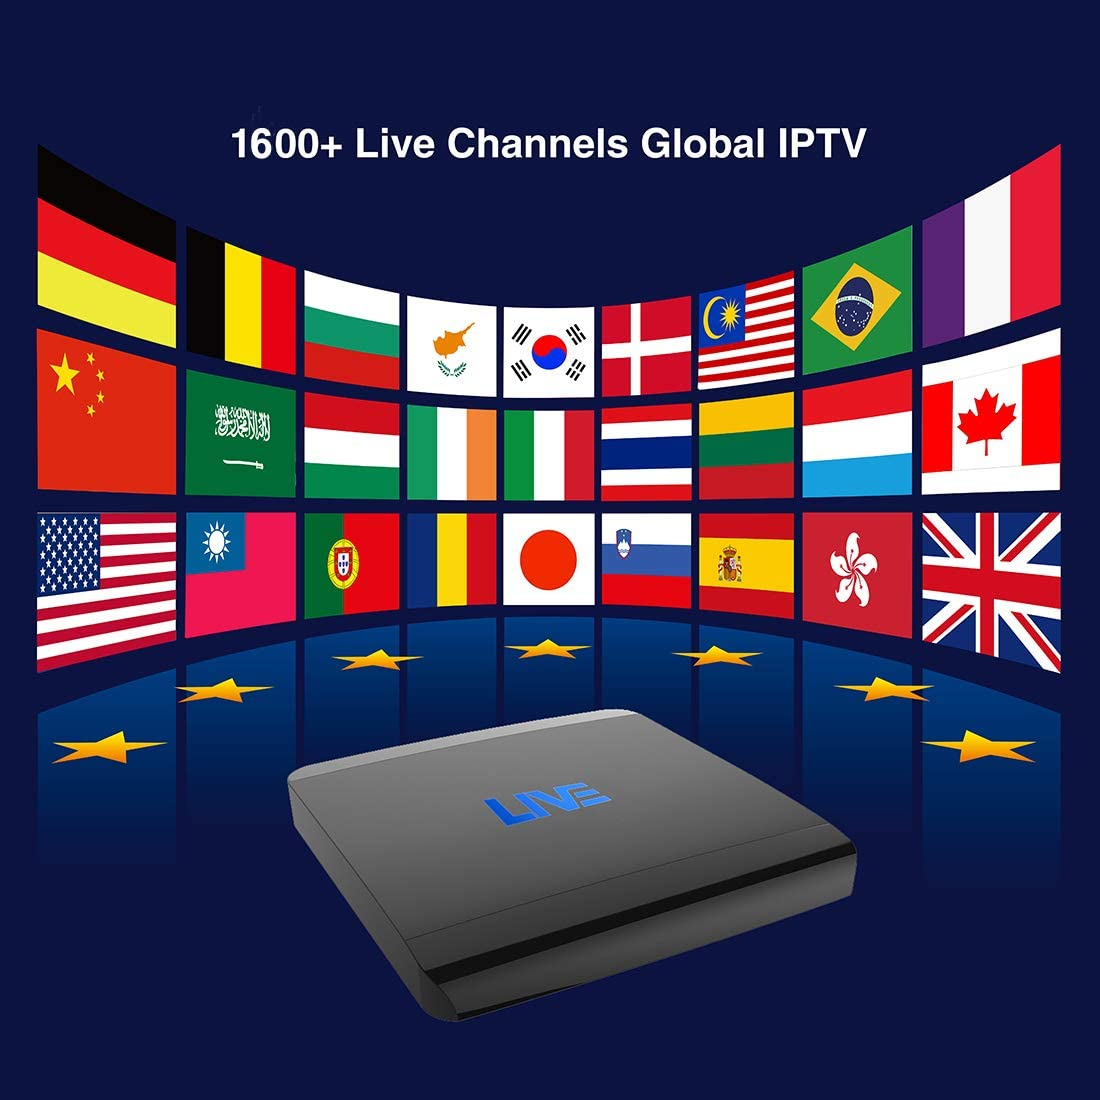 Livebox IPTV Receptor 1500 + Global Live Channels de Asia América Europa Arabic Brasil, sin Costo mensual / Anual: Amazon.es: Electrónica